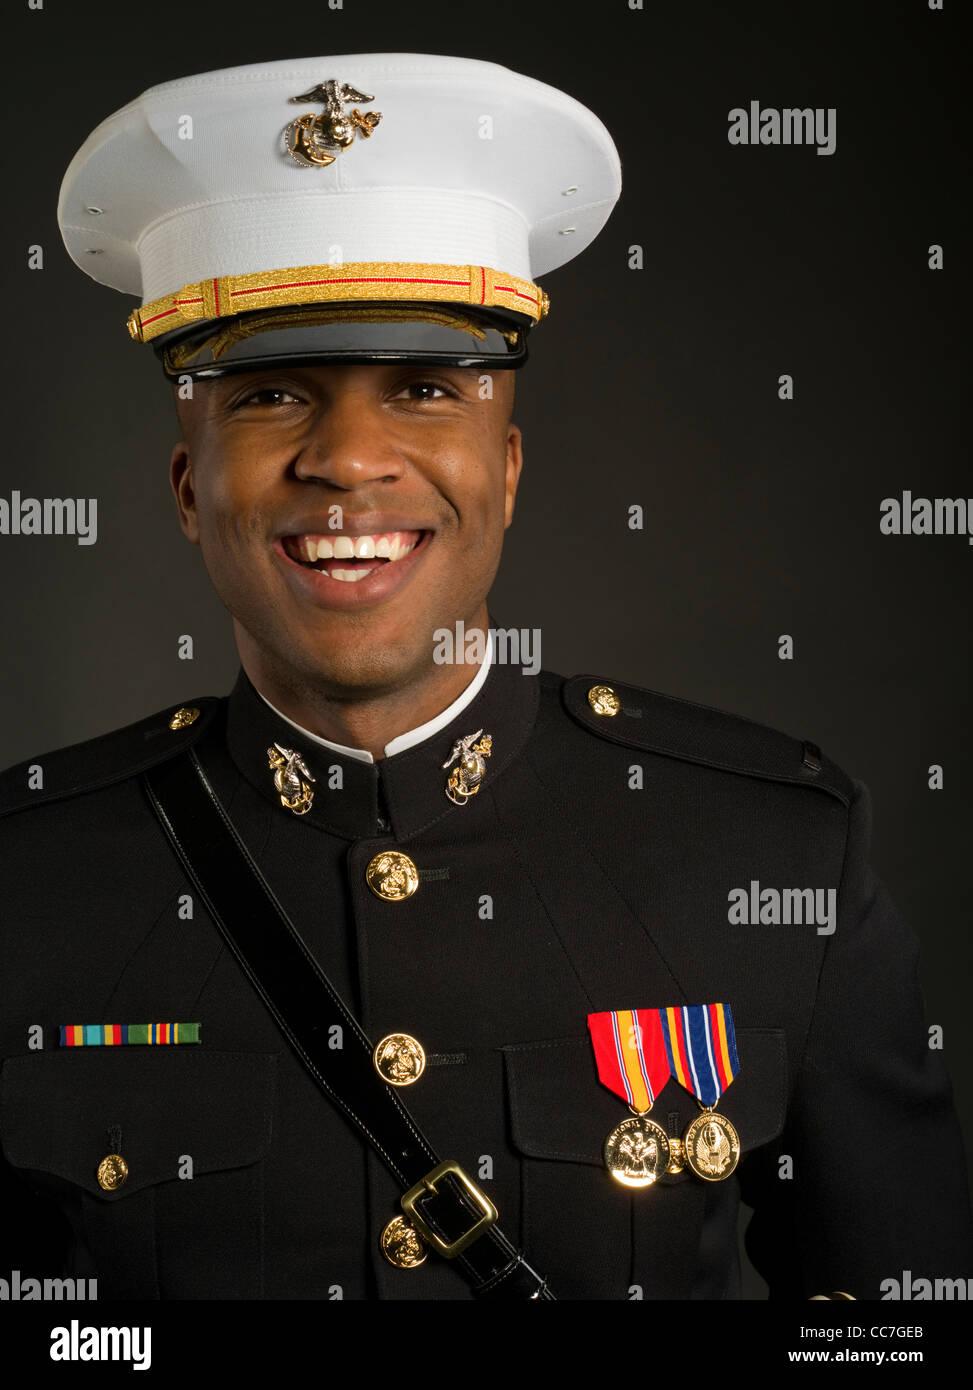 Marine Officer Dress Blue Uniform 59